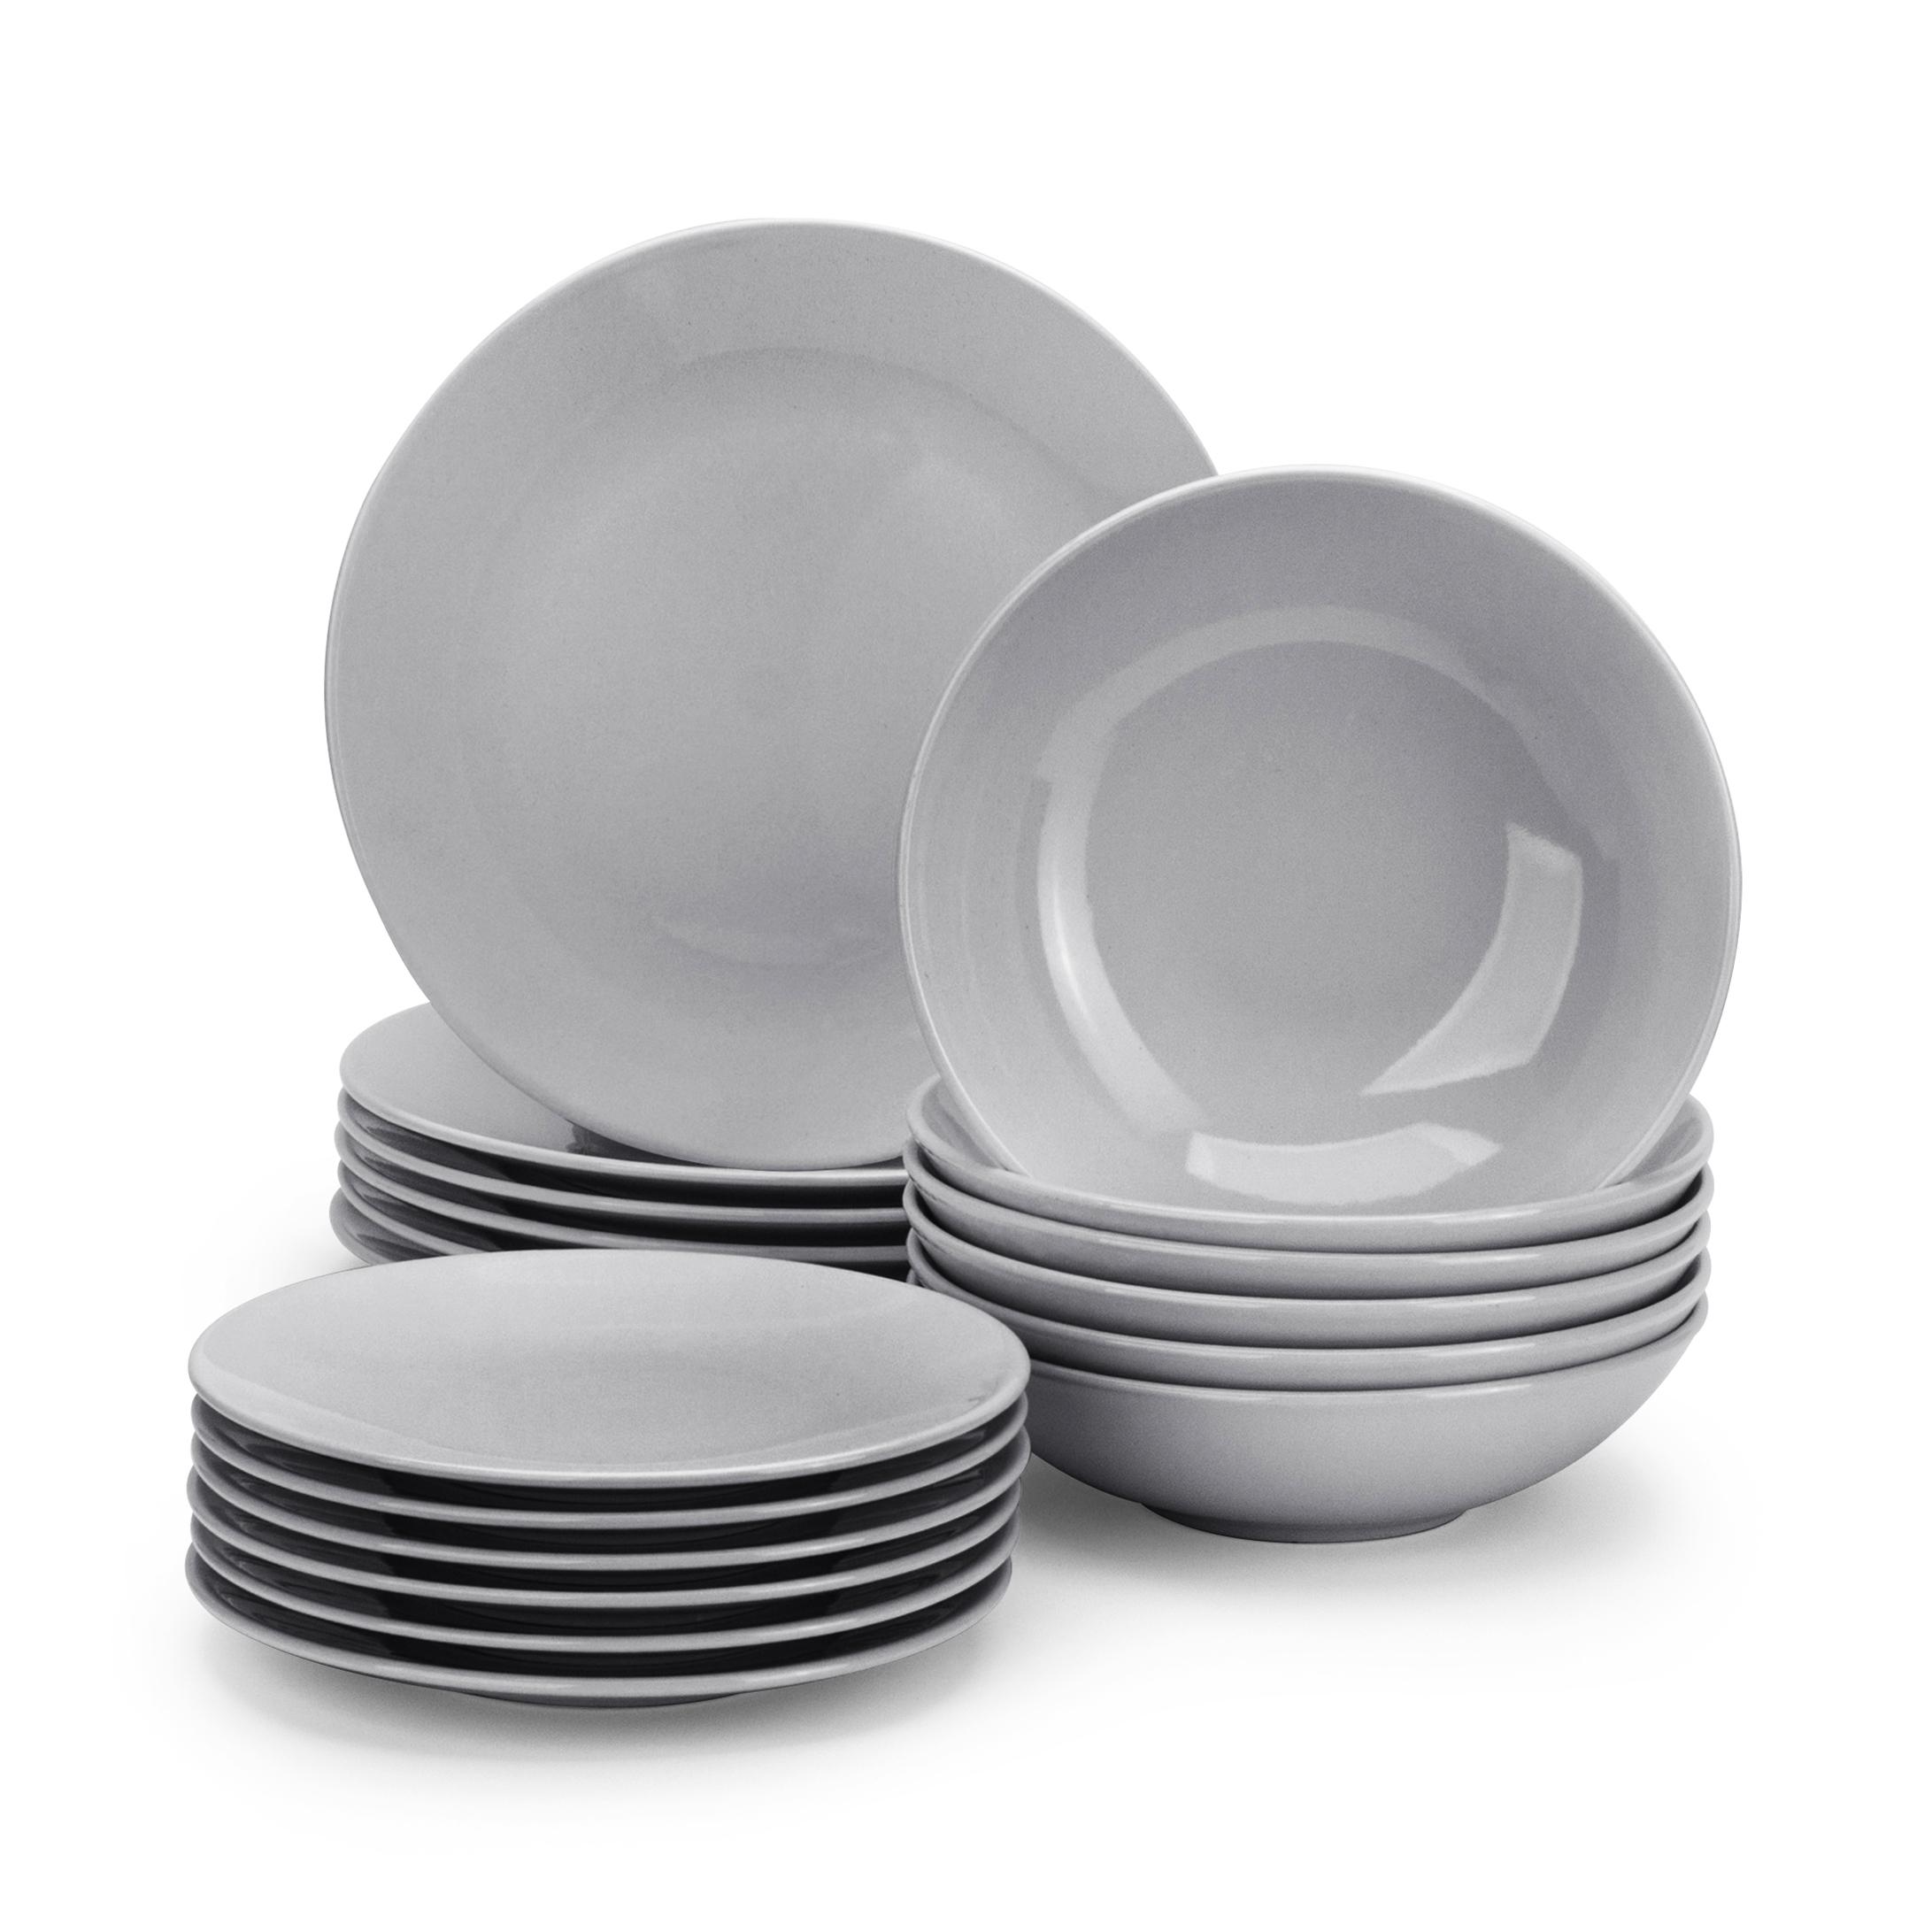 Tafelservice 6 Personen 18 Tlg Keramik Geschirr Set Kombiservice Grau Modern